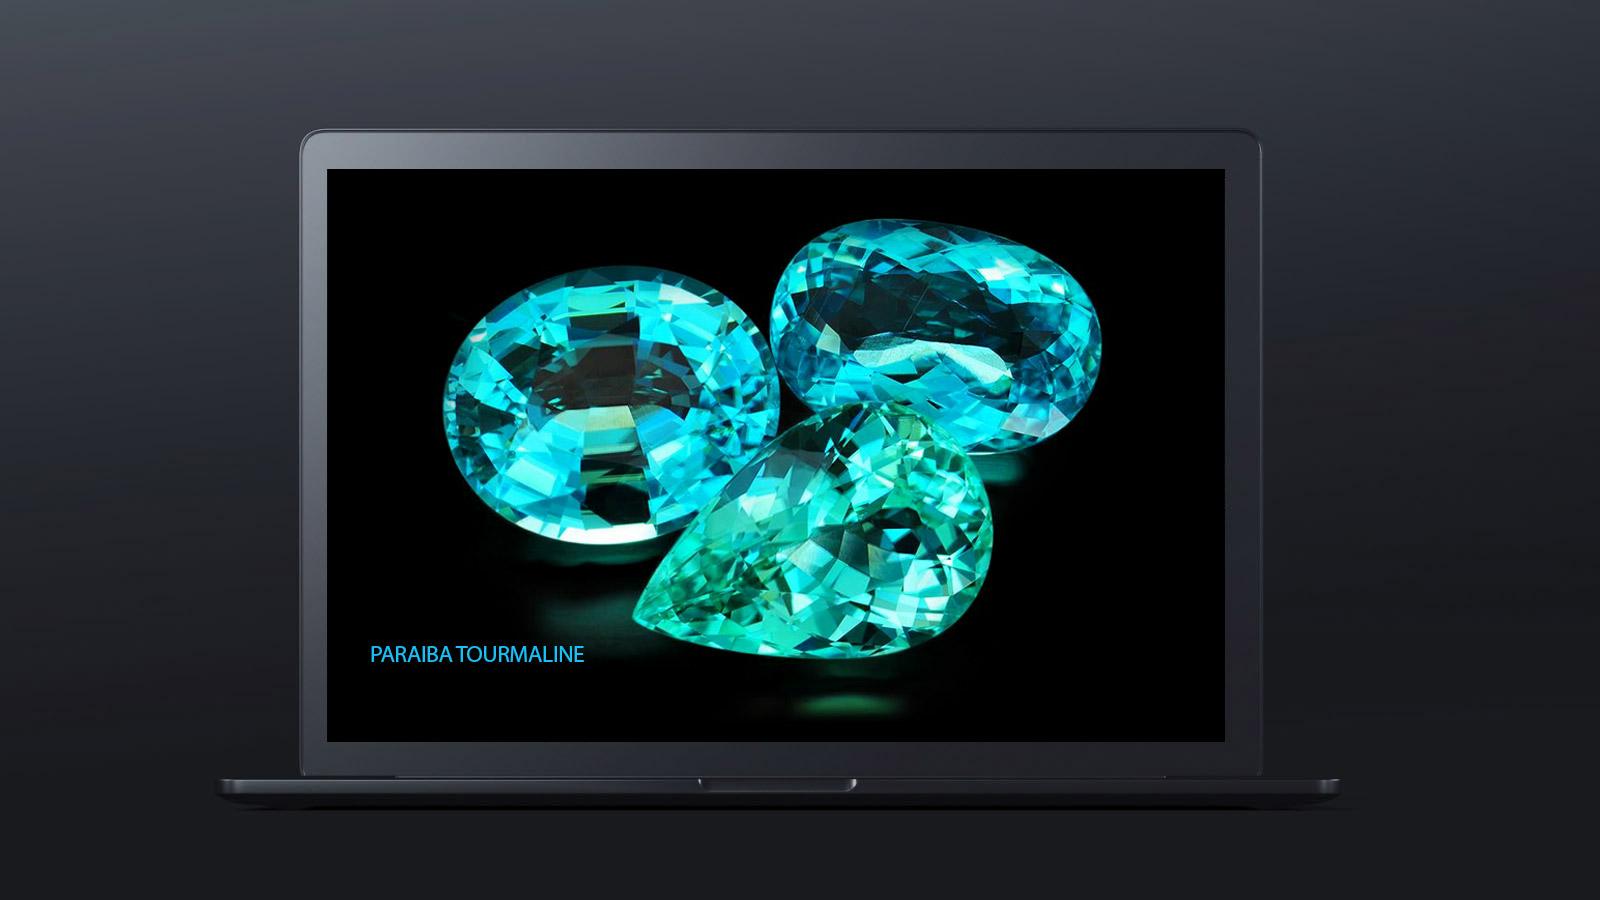 10 worlds rarest gemstones PARAIBA TOURMALINE 1 - ده گوهر کمیاب دنیا کدامند؟